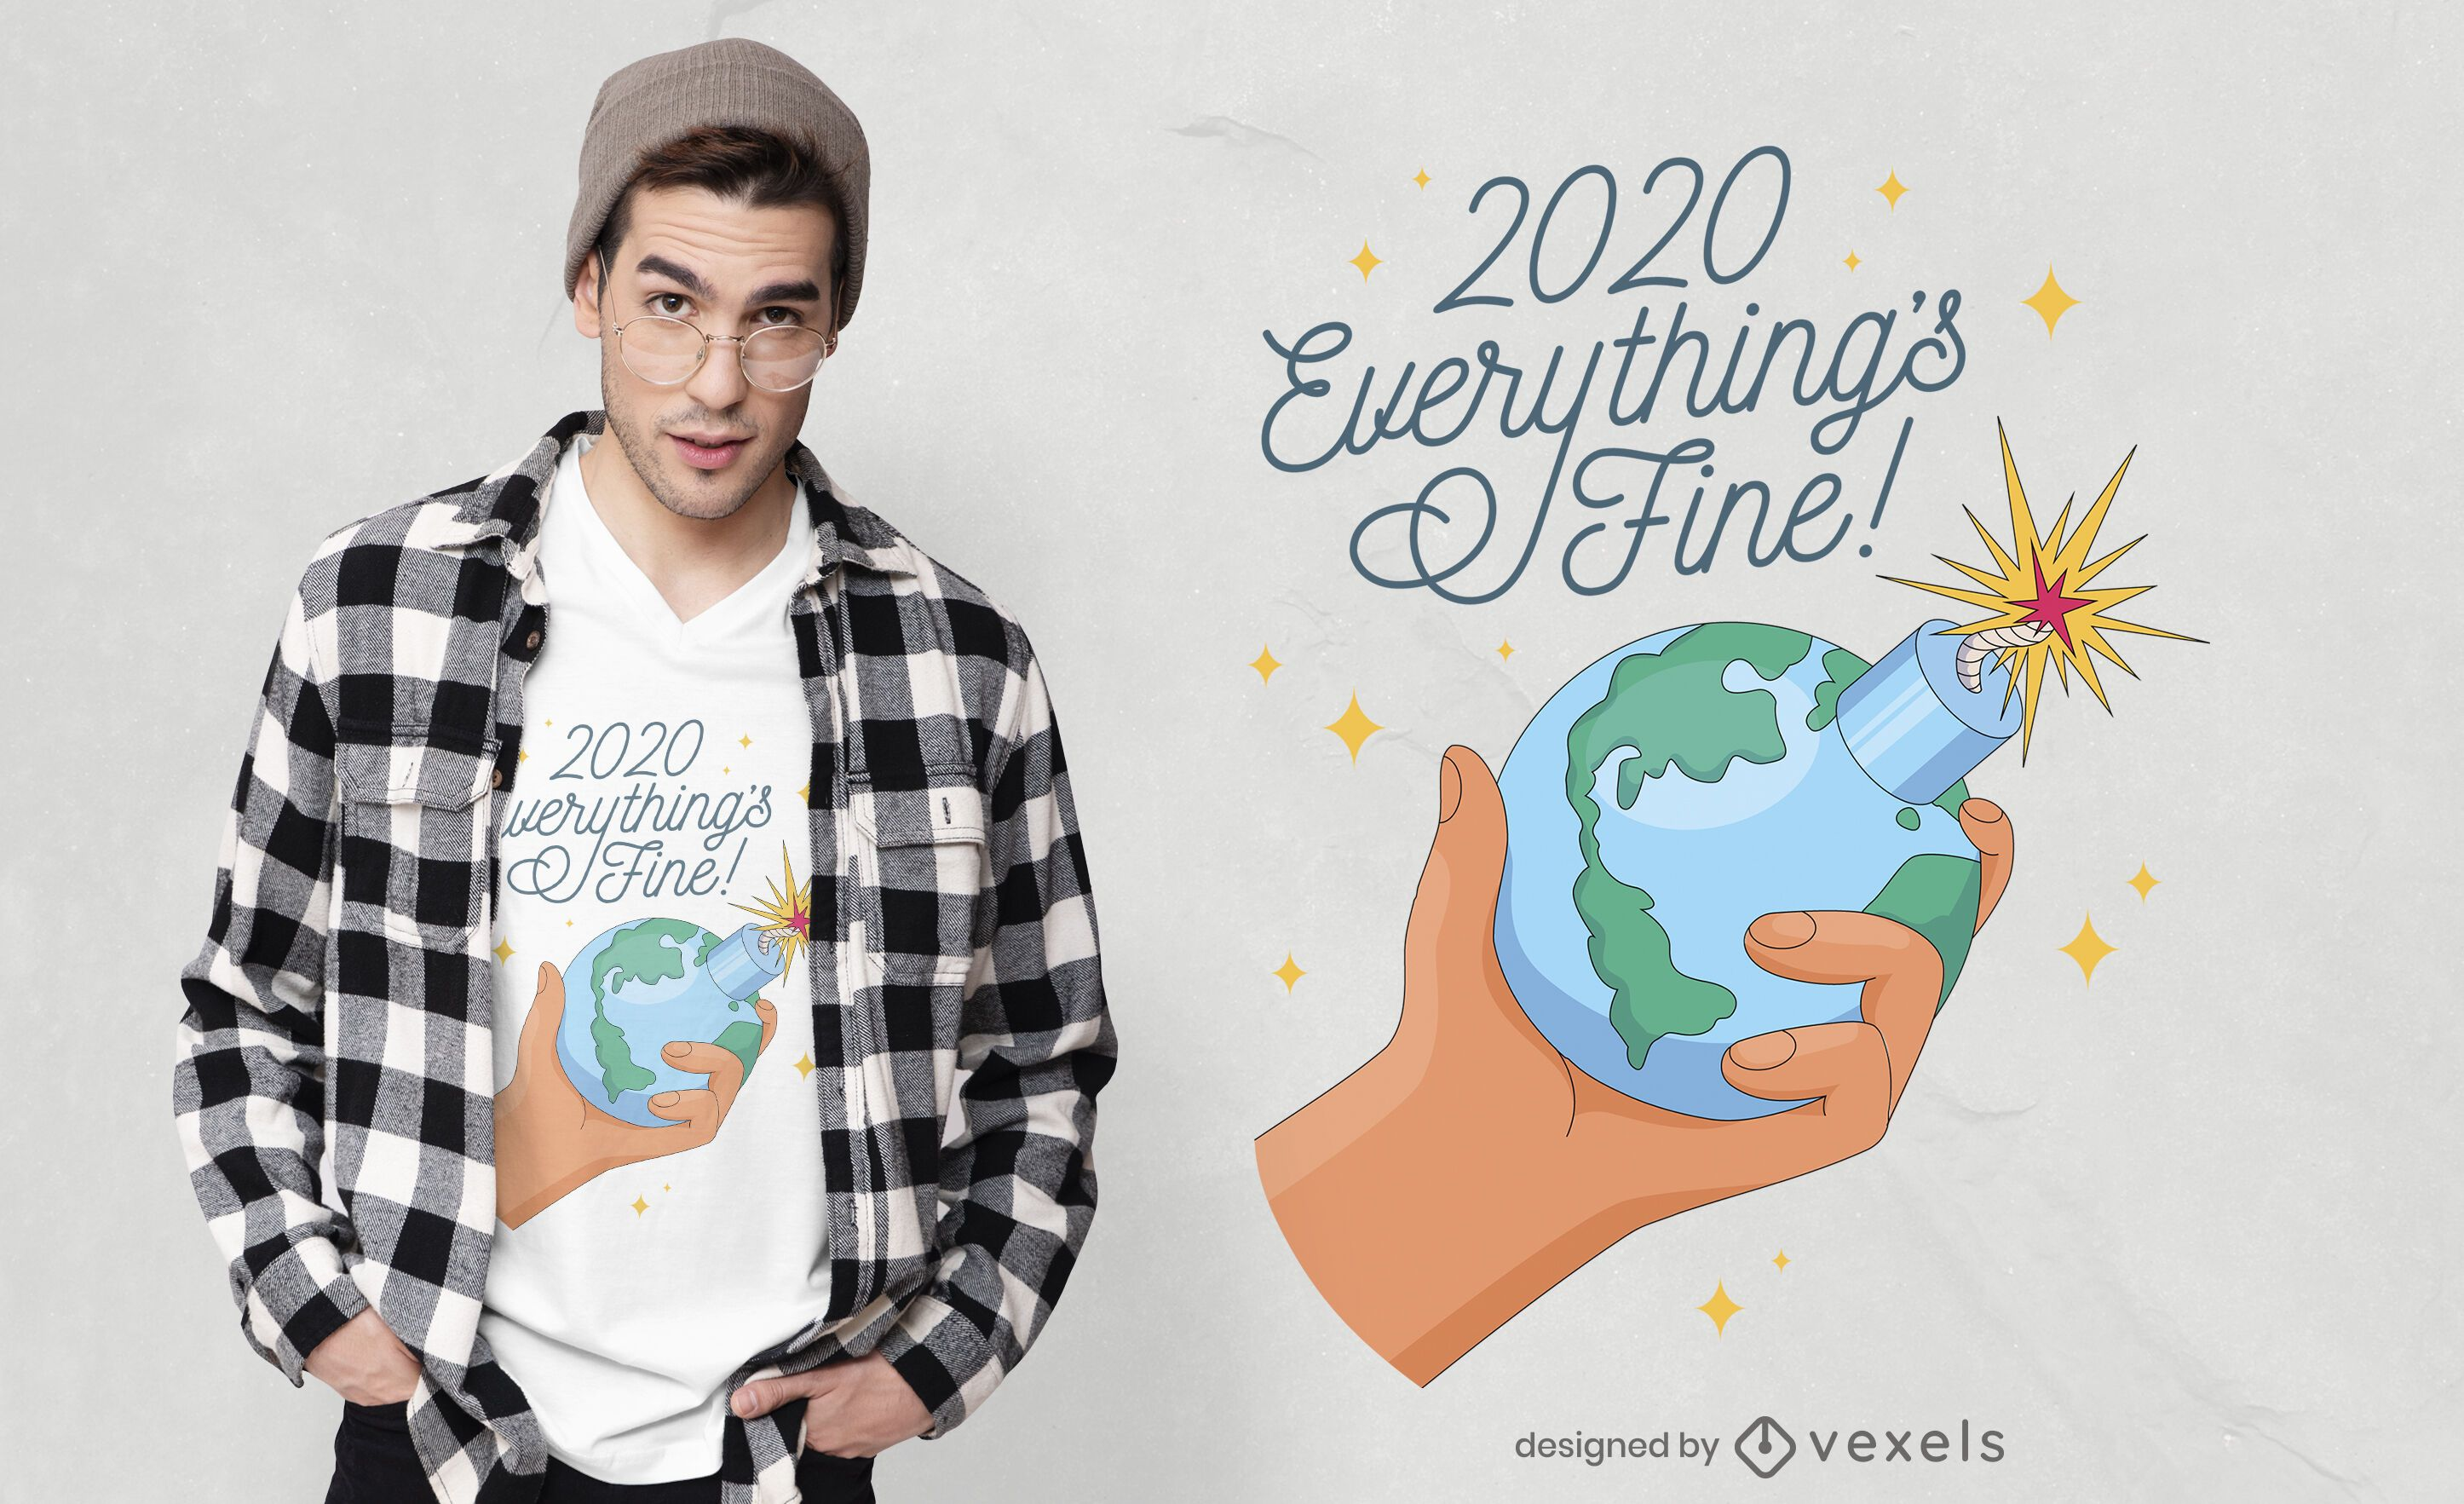 2020 everythings fine t-shirt design